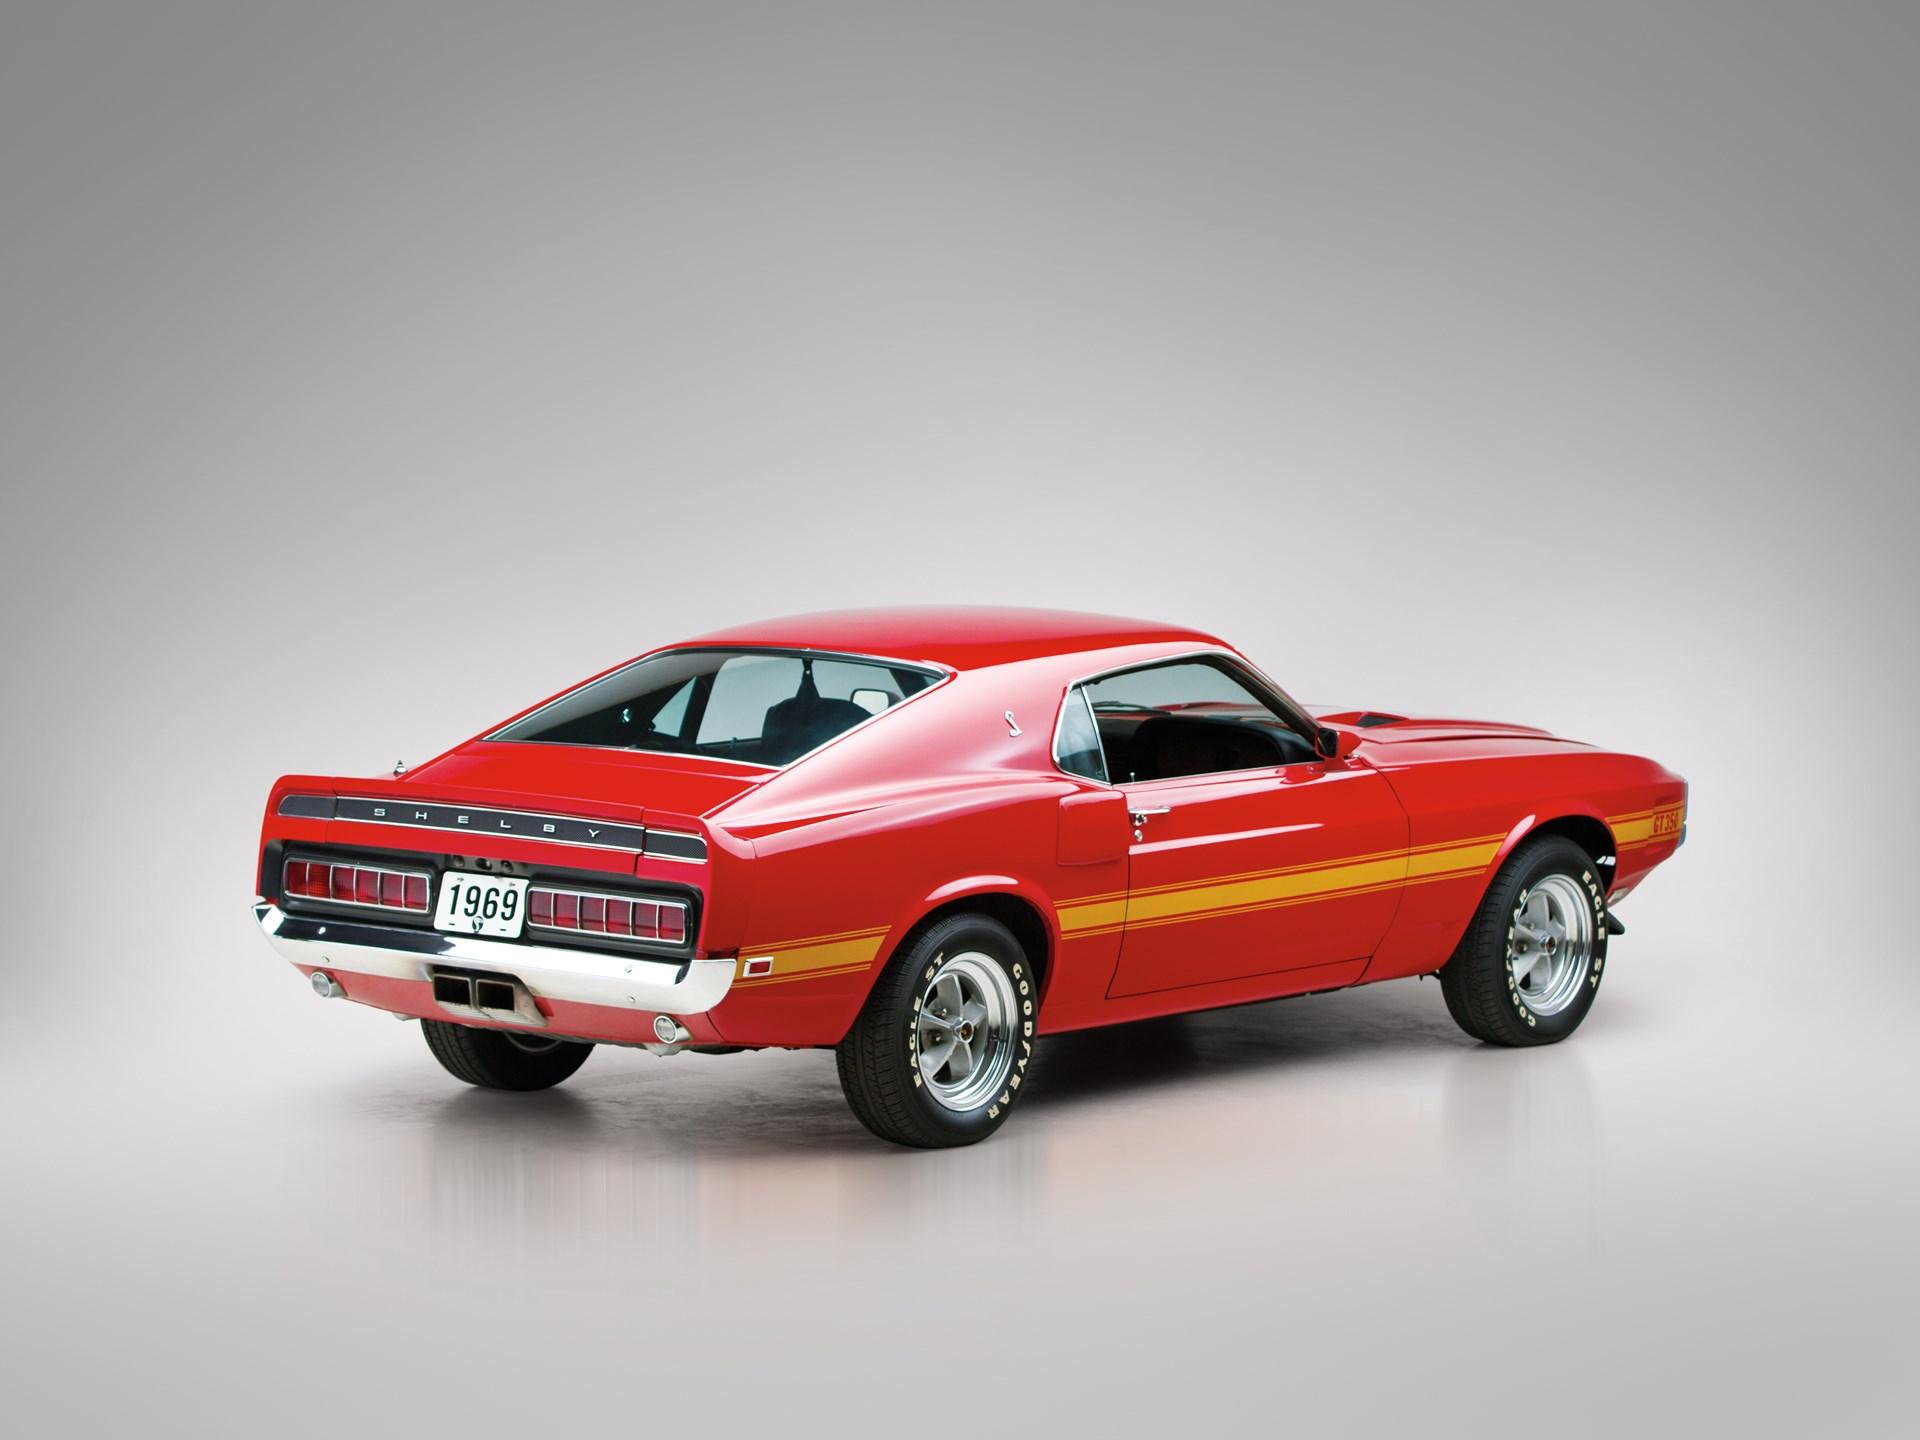 1969 Shelby Mustang GT350 rear 3/4